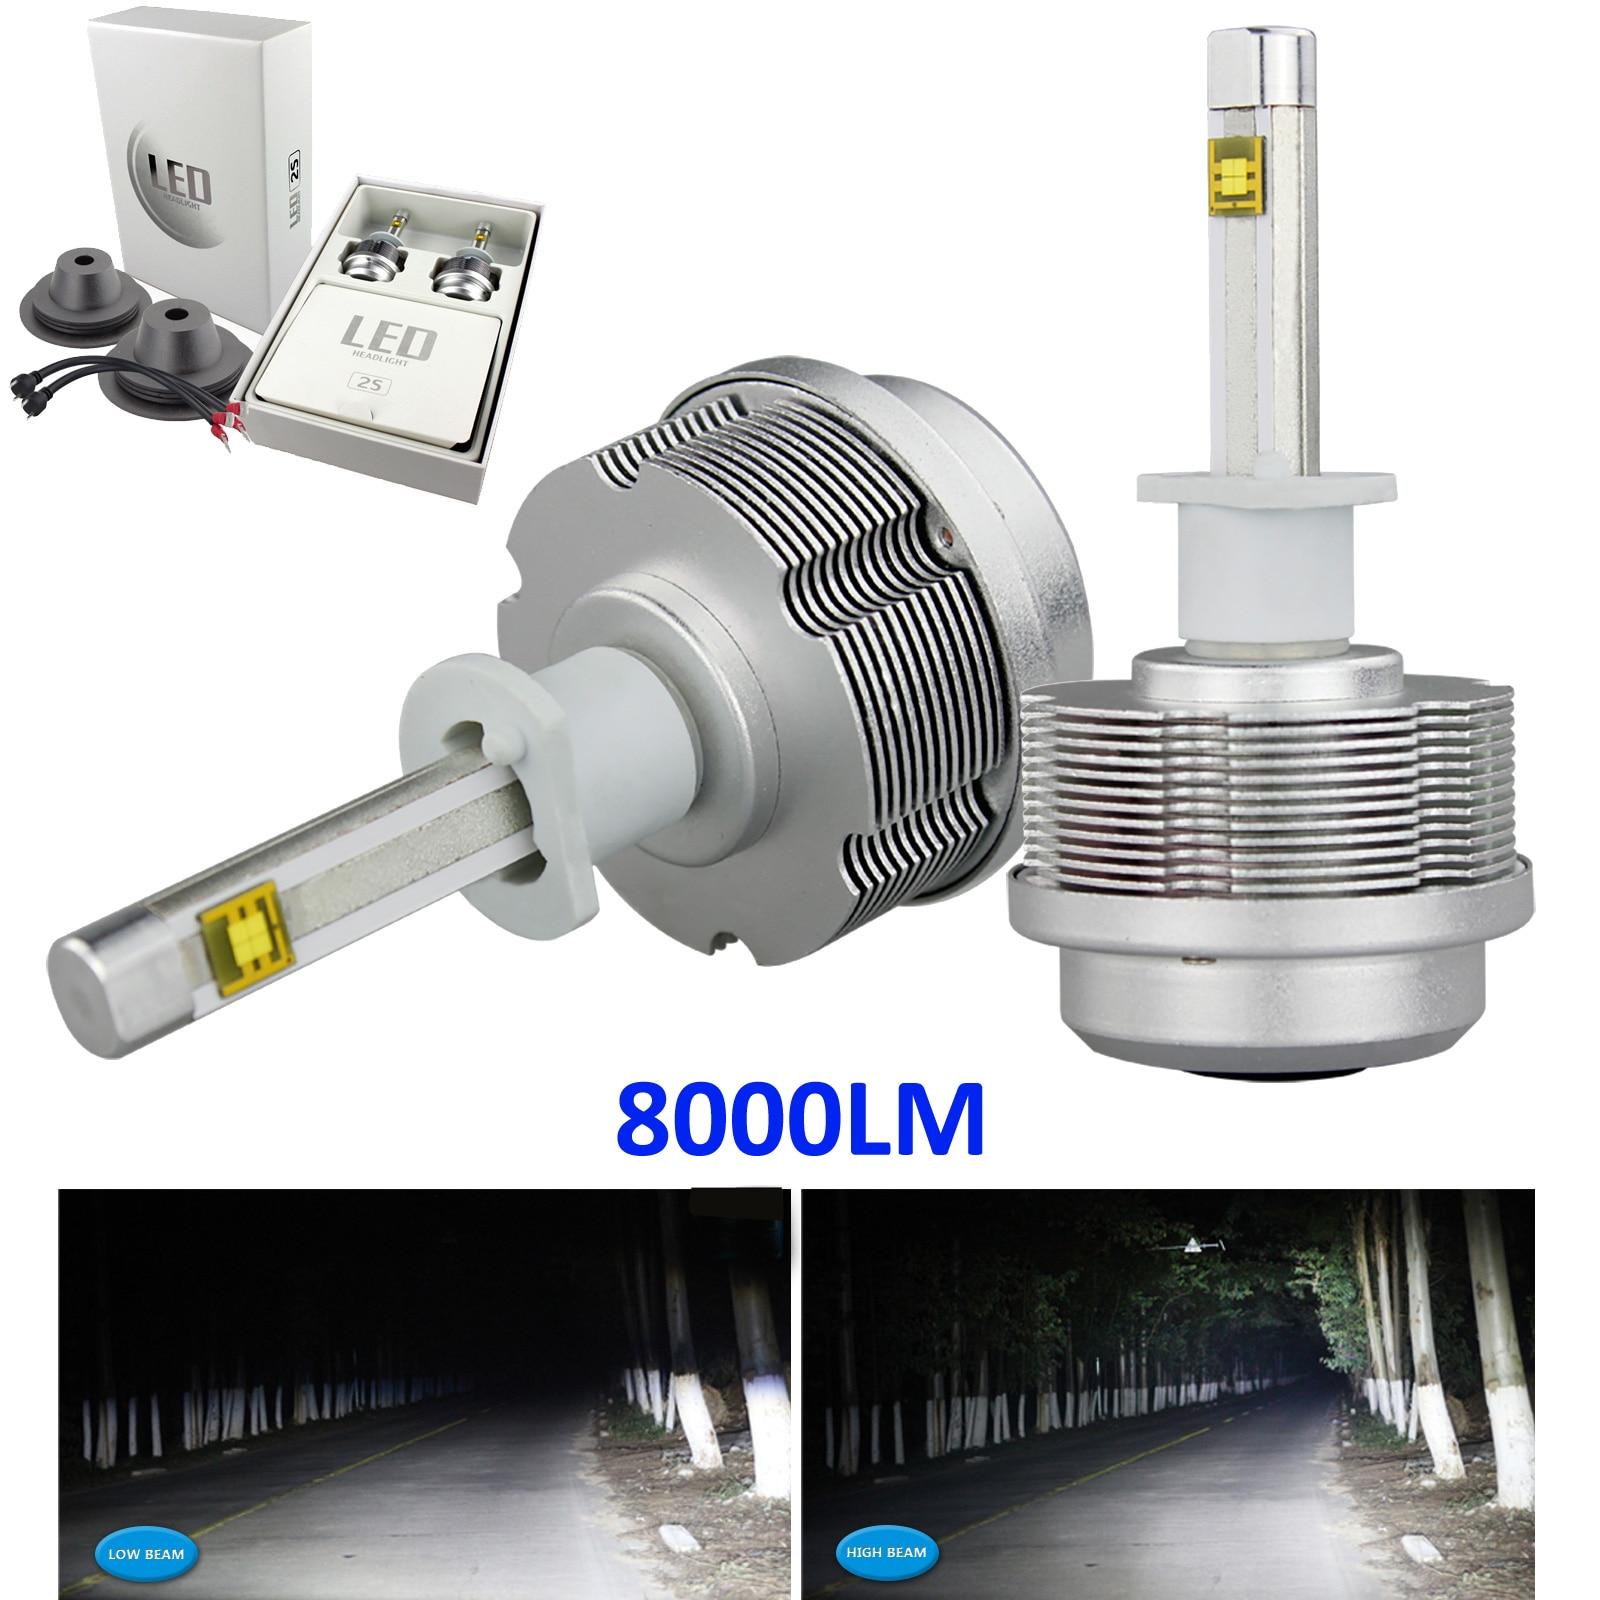 ФОТО 1pair Car H1 60W ETI 2S Car LED Headlight Kit 8000LM HID 6000K White High or Low Beam Bulbs